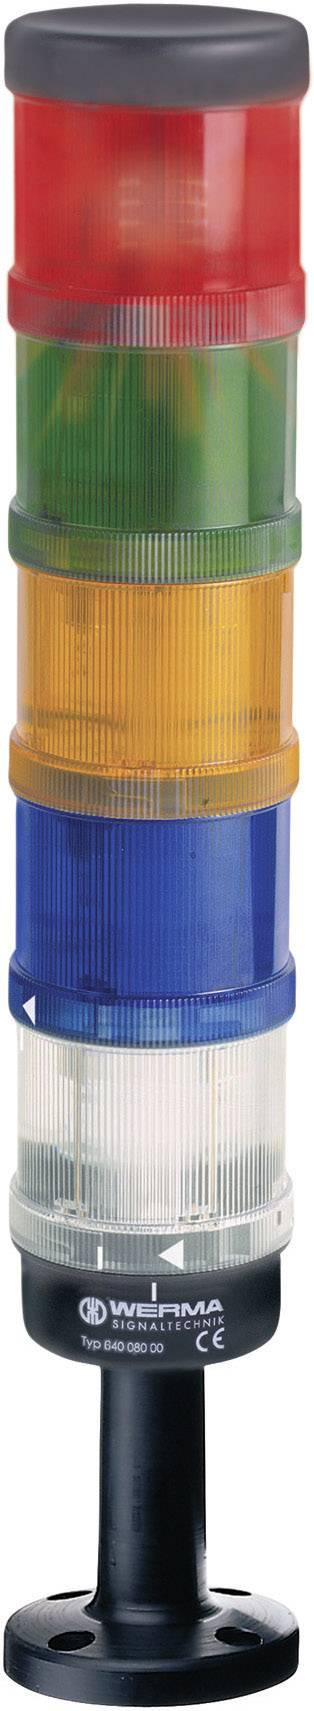 Blikající signálka Werma 644.310.75, dioda LED, 70 x 65 mm, IP65, žlutá